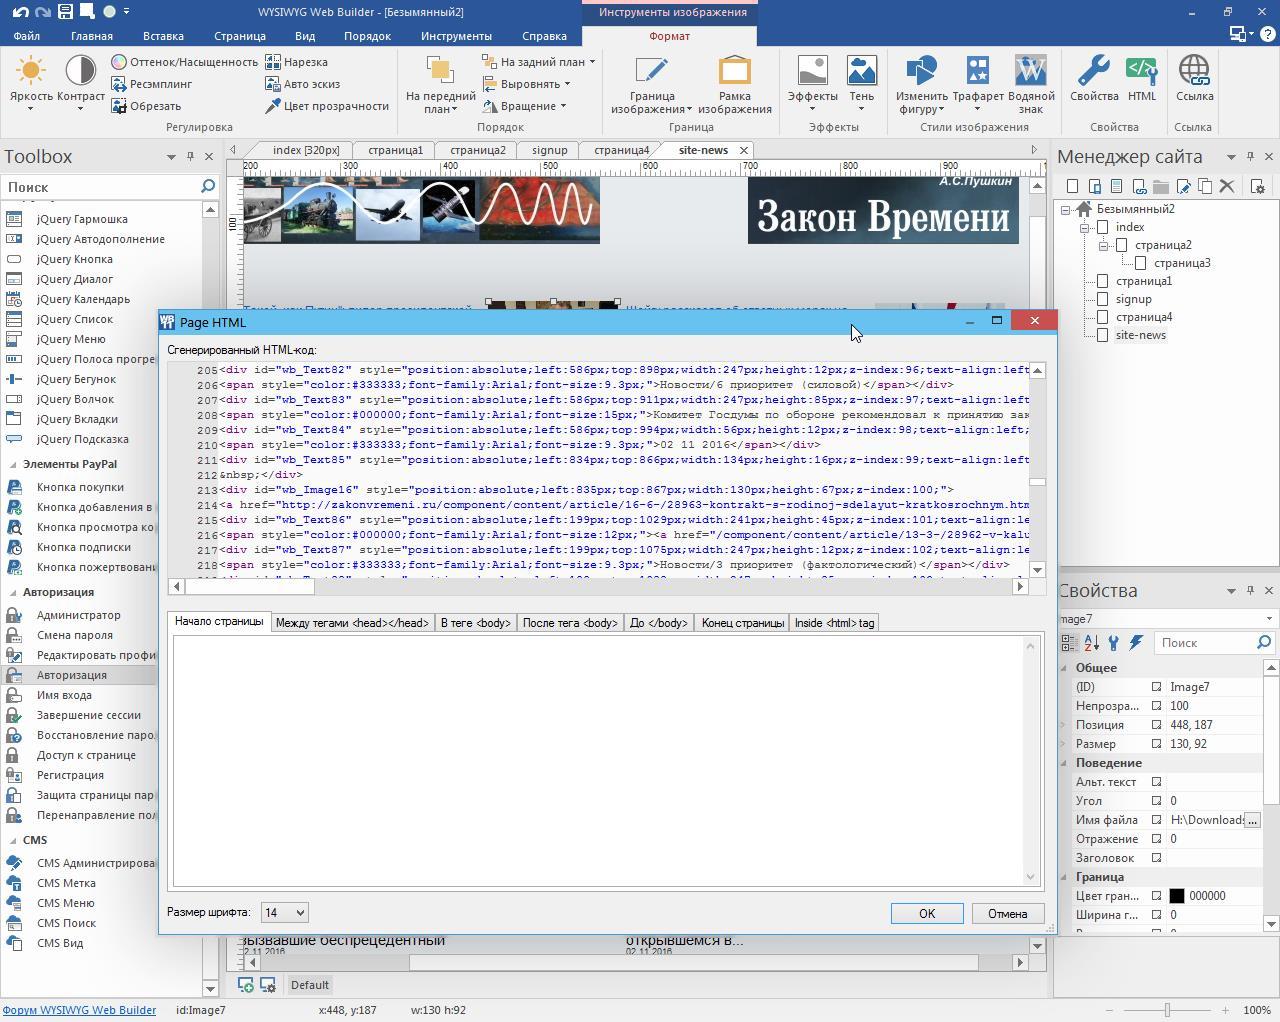 programma-wysiwyg-web-builder-11